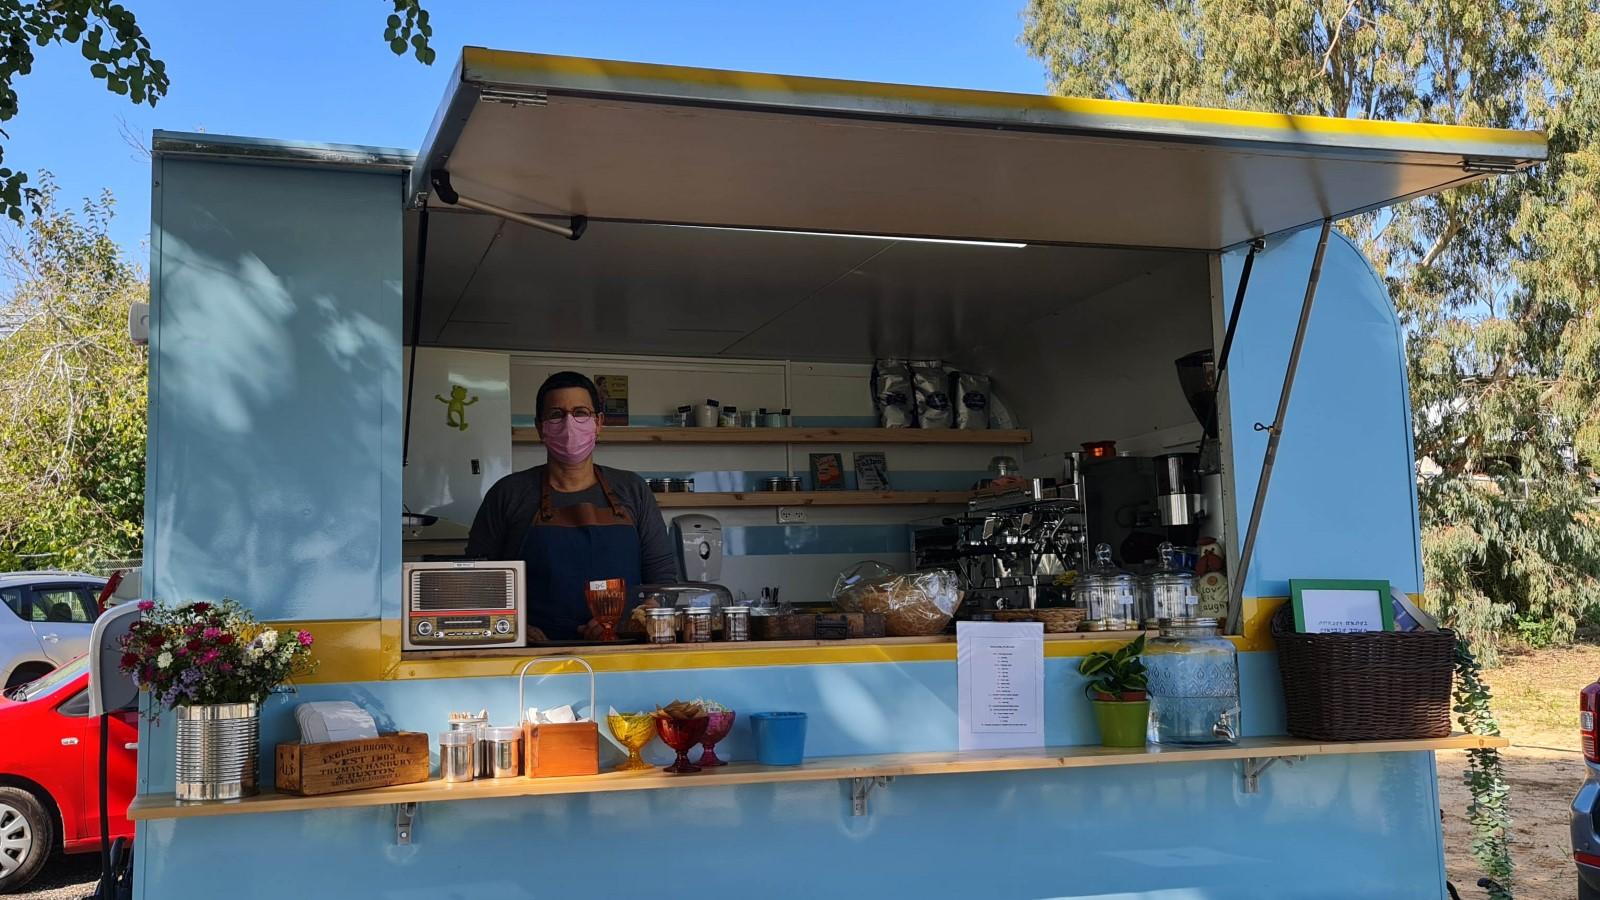 Gili's Coffee stand at Avichail   DesignLife   Ifat Angel